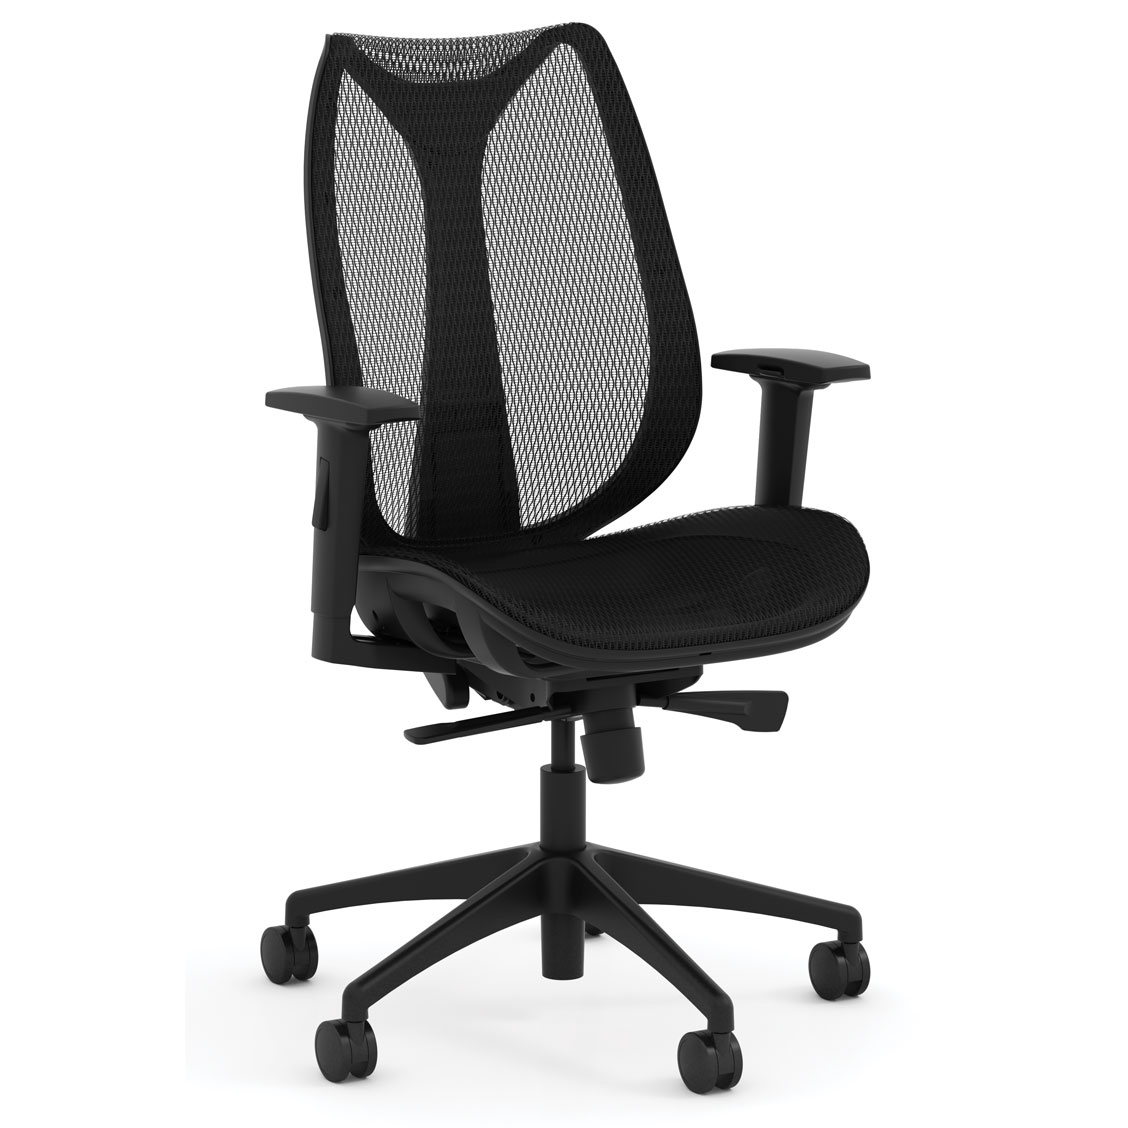 All Mesh High Back Chair with Synchro Tilt